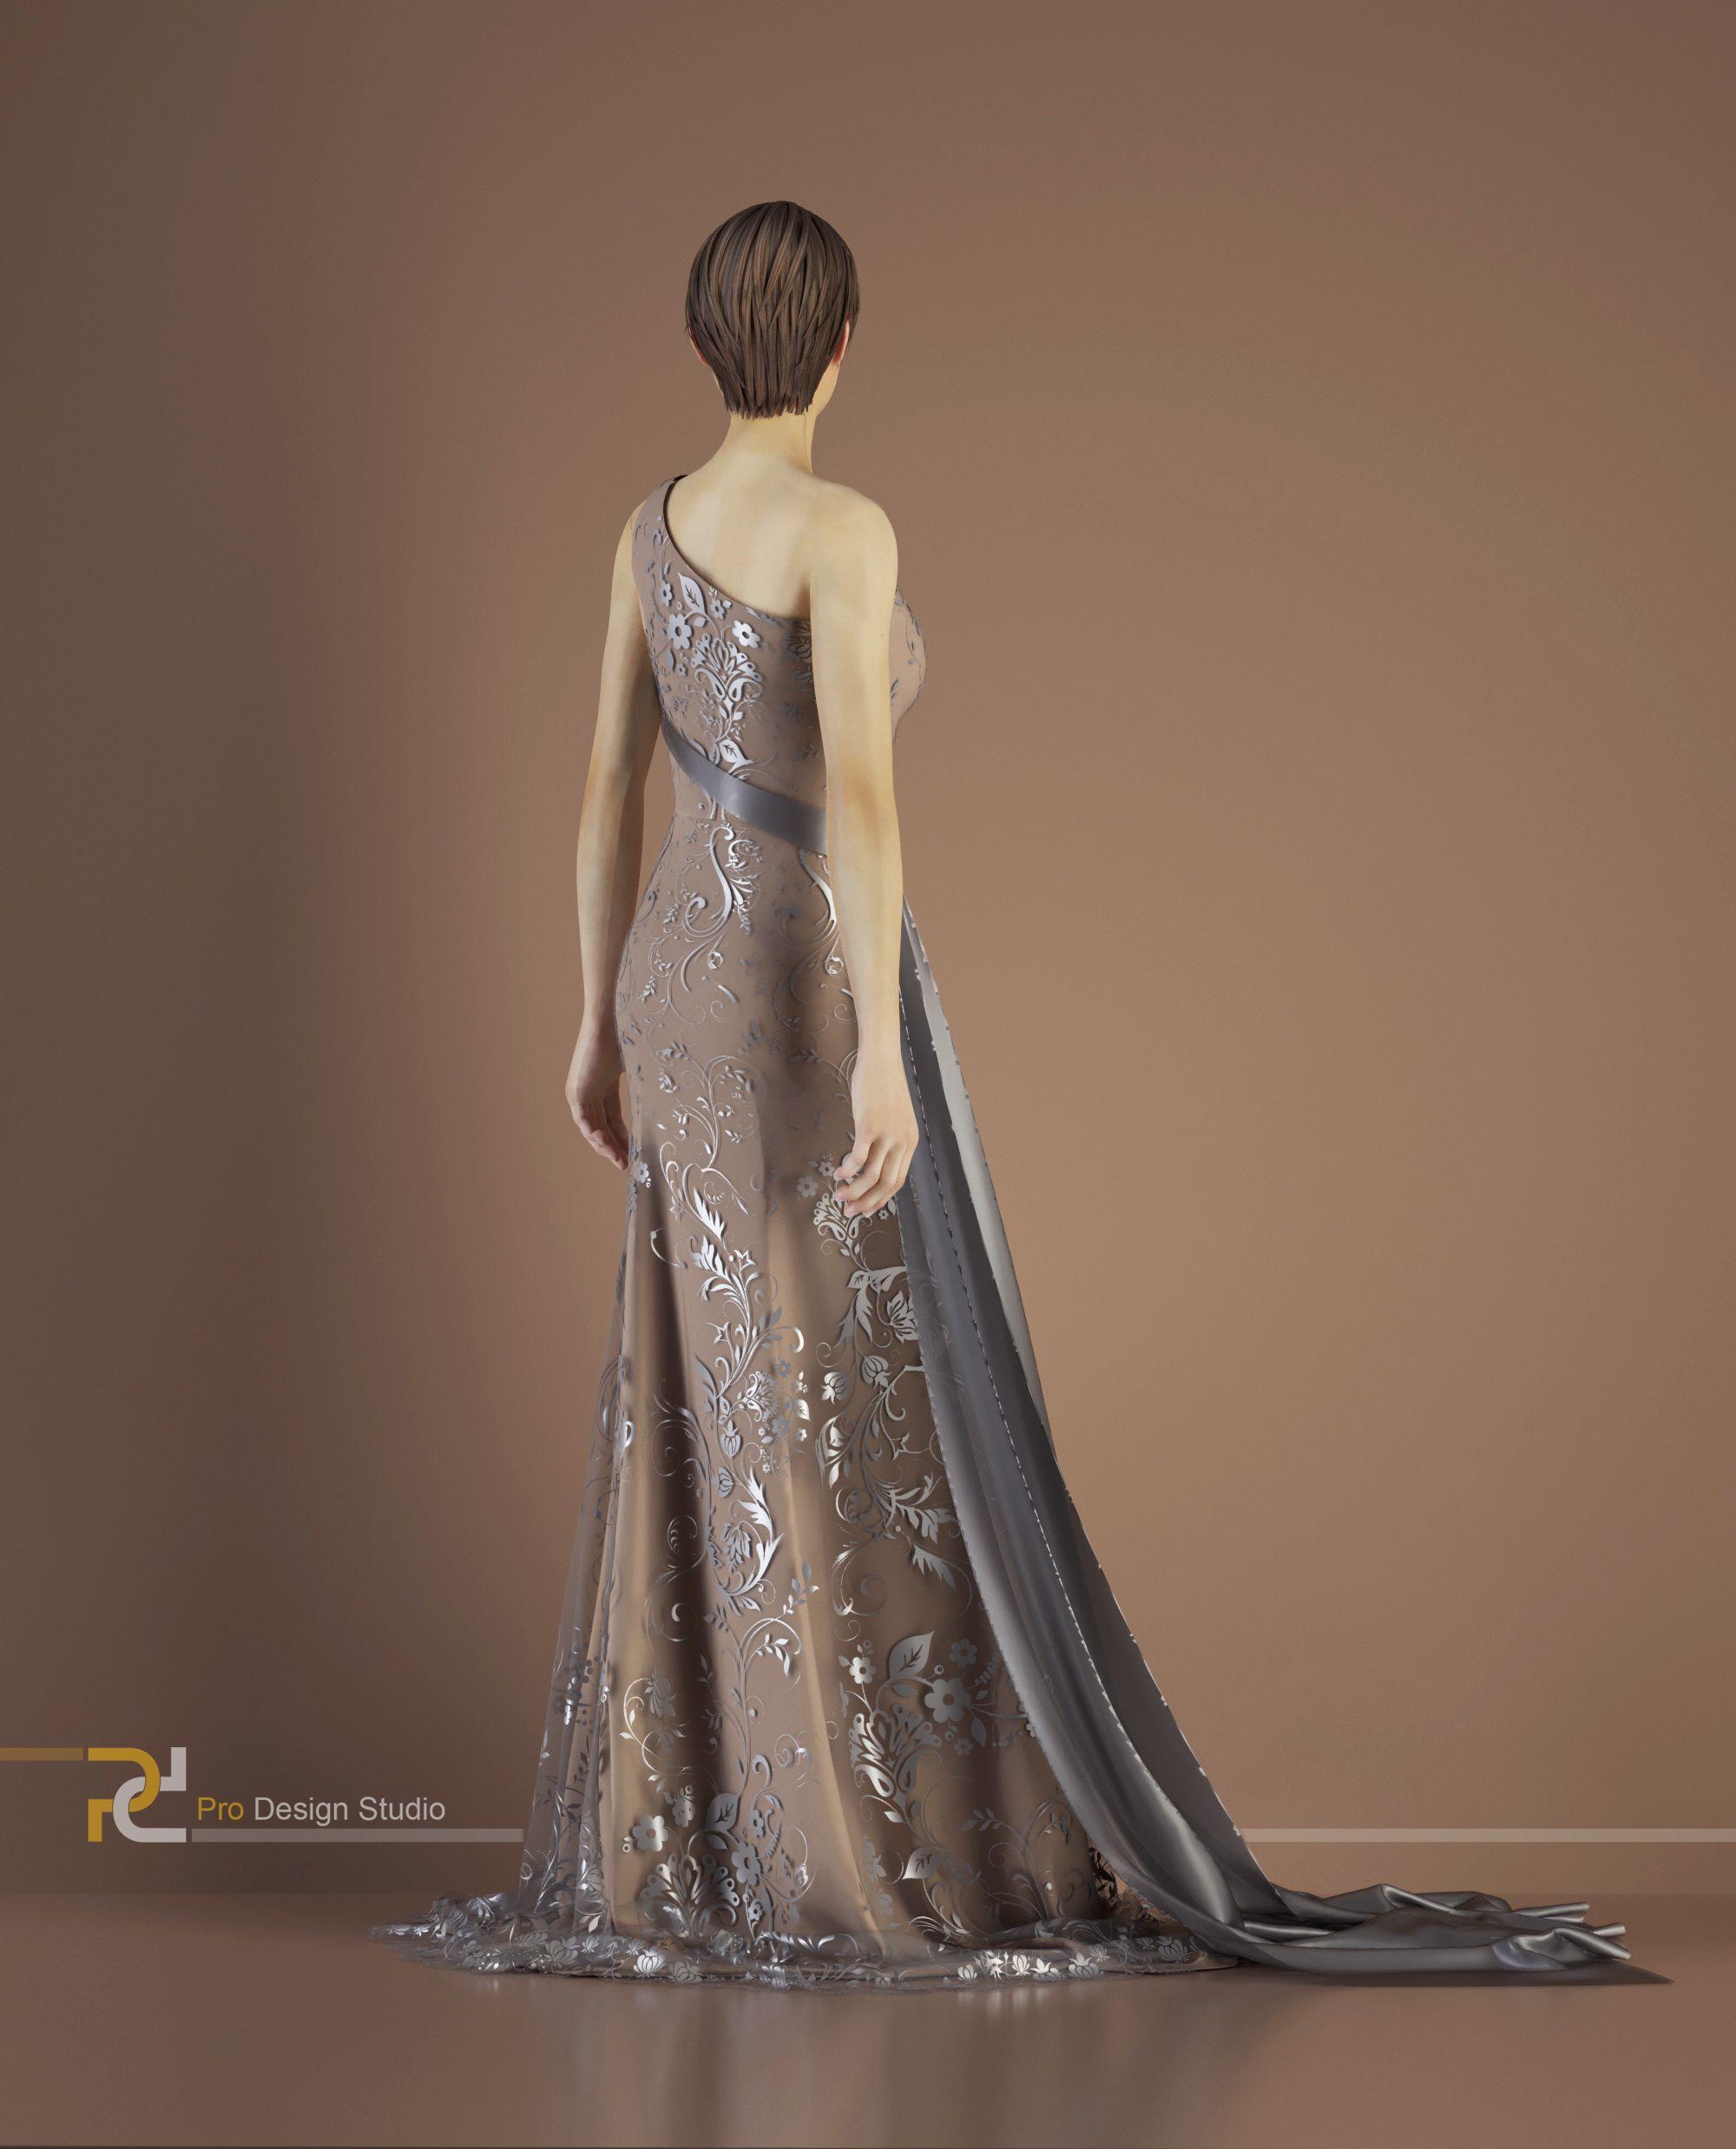 Marvelous Designer Marvelous Designer Virtual Fashion Fashion